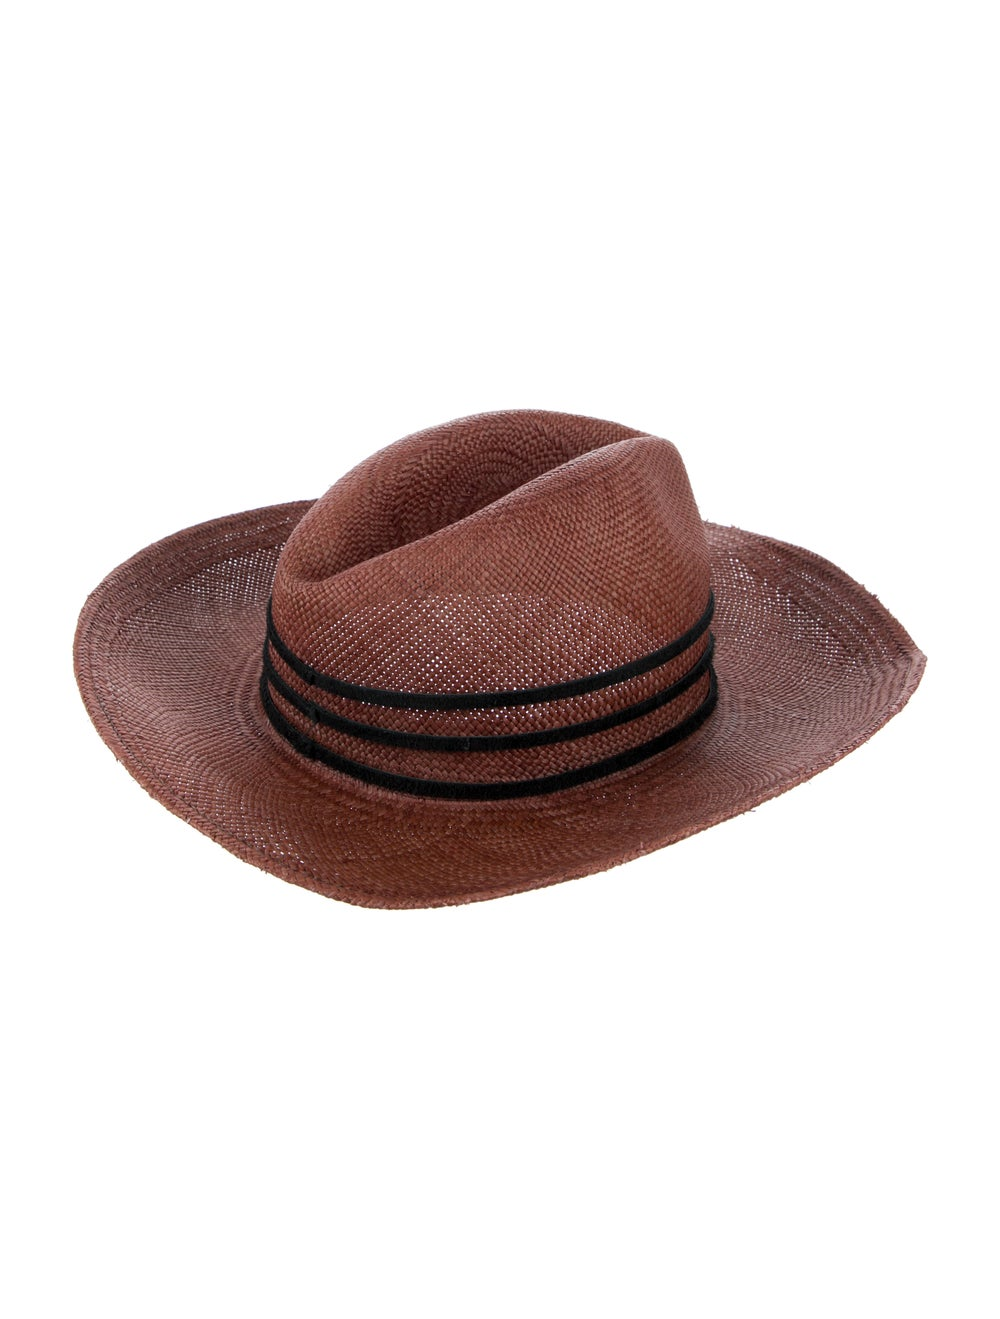 Janessa Leone Straw Fedora Hat red - image 2